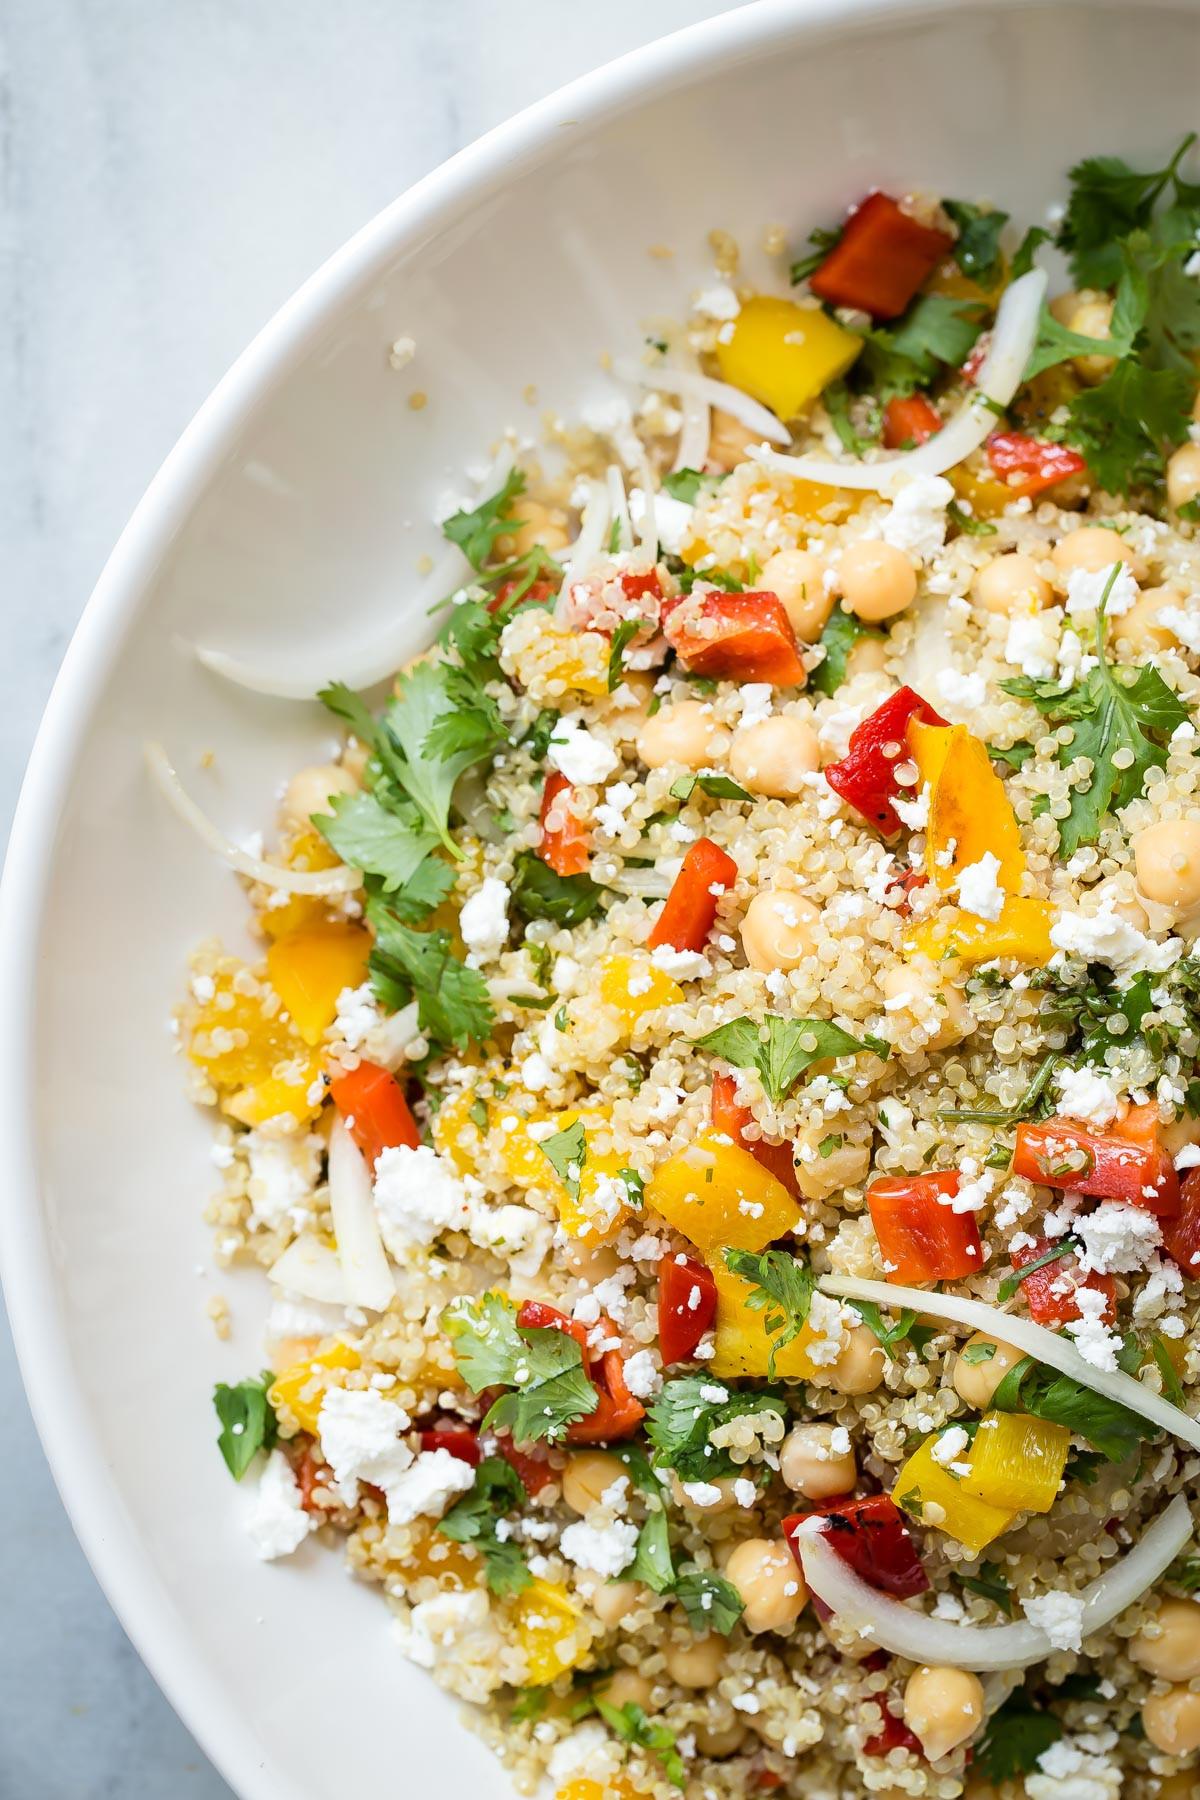 Quinoa Healthy Recipes  Healthy Quinoa Salad with Feta Cheese